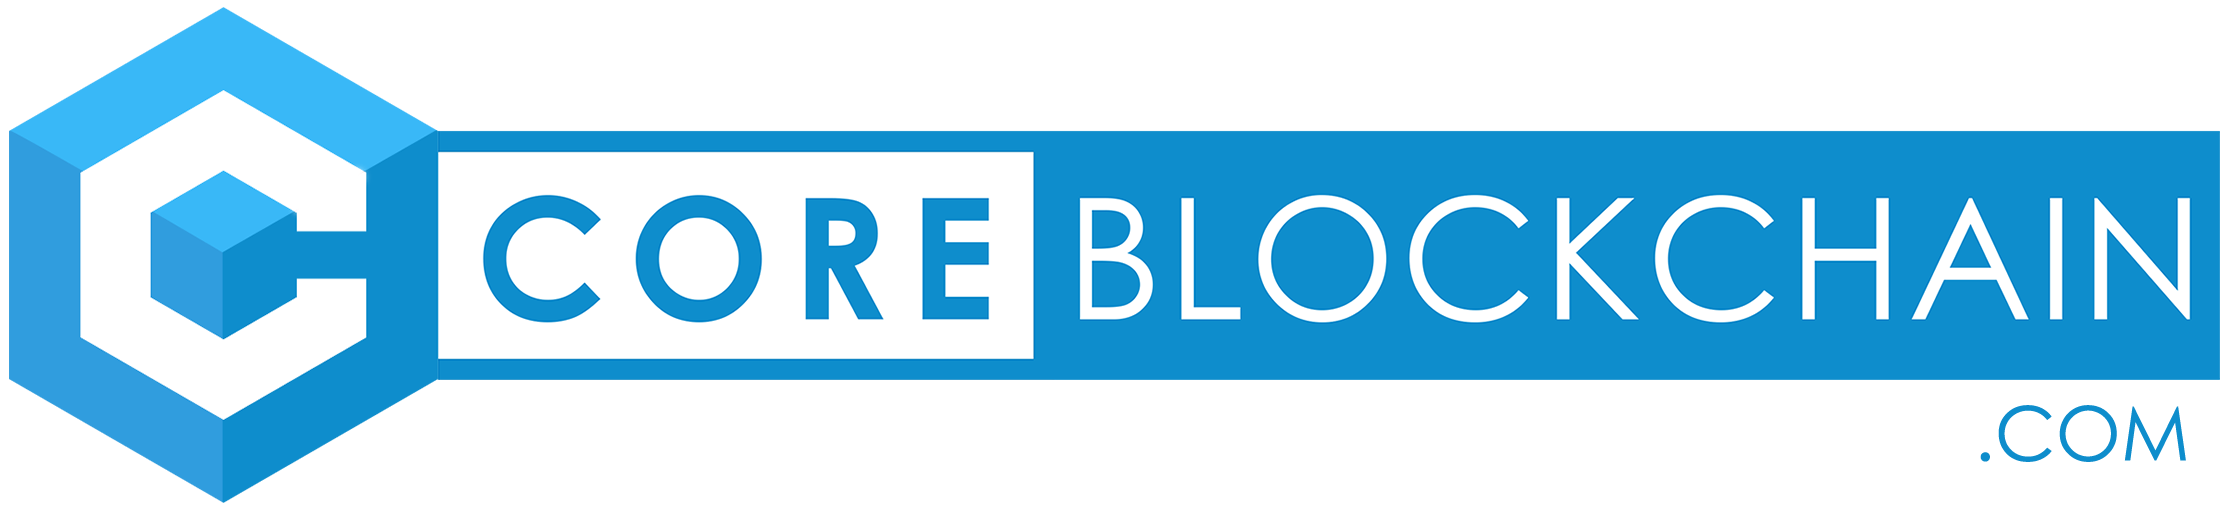 Core Blockchain-logo